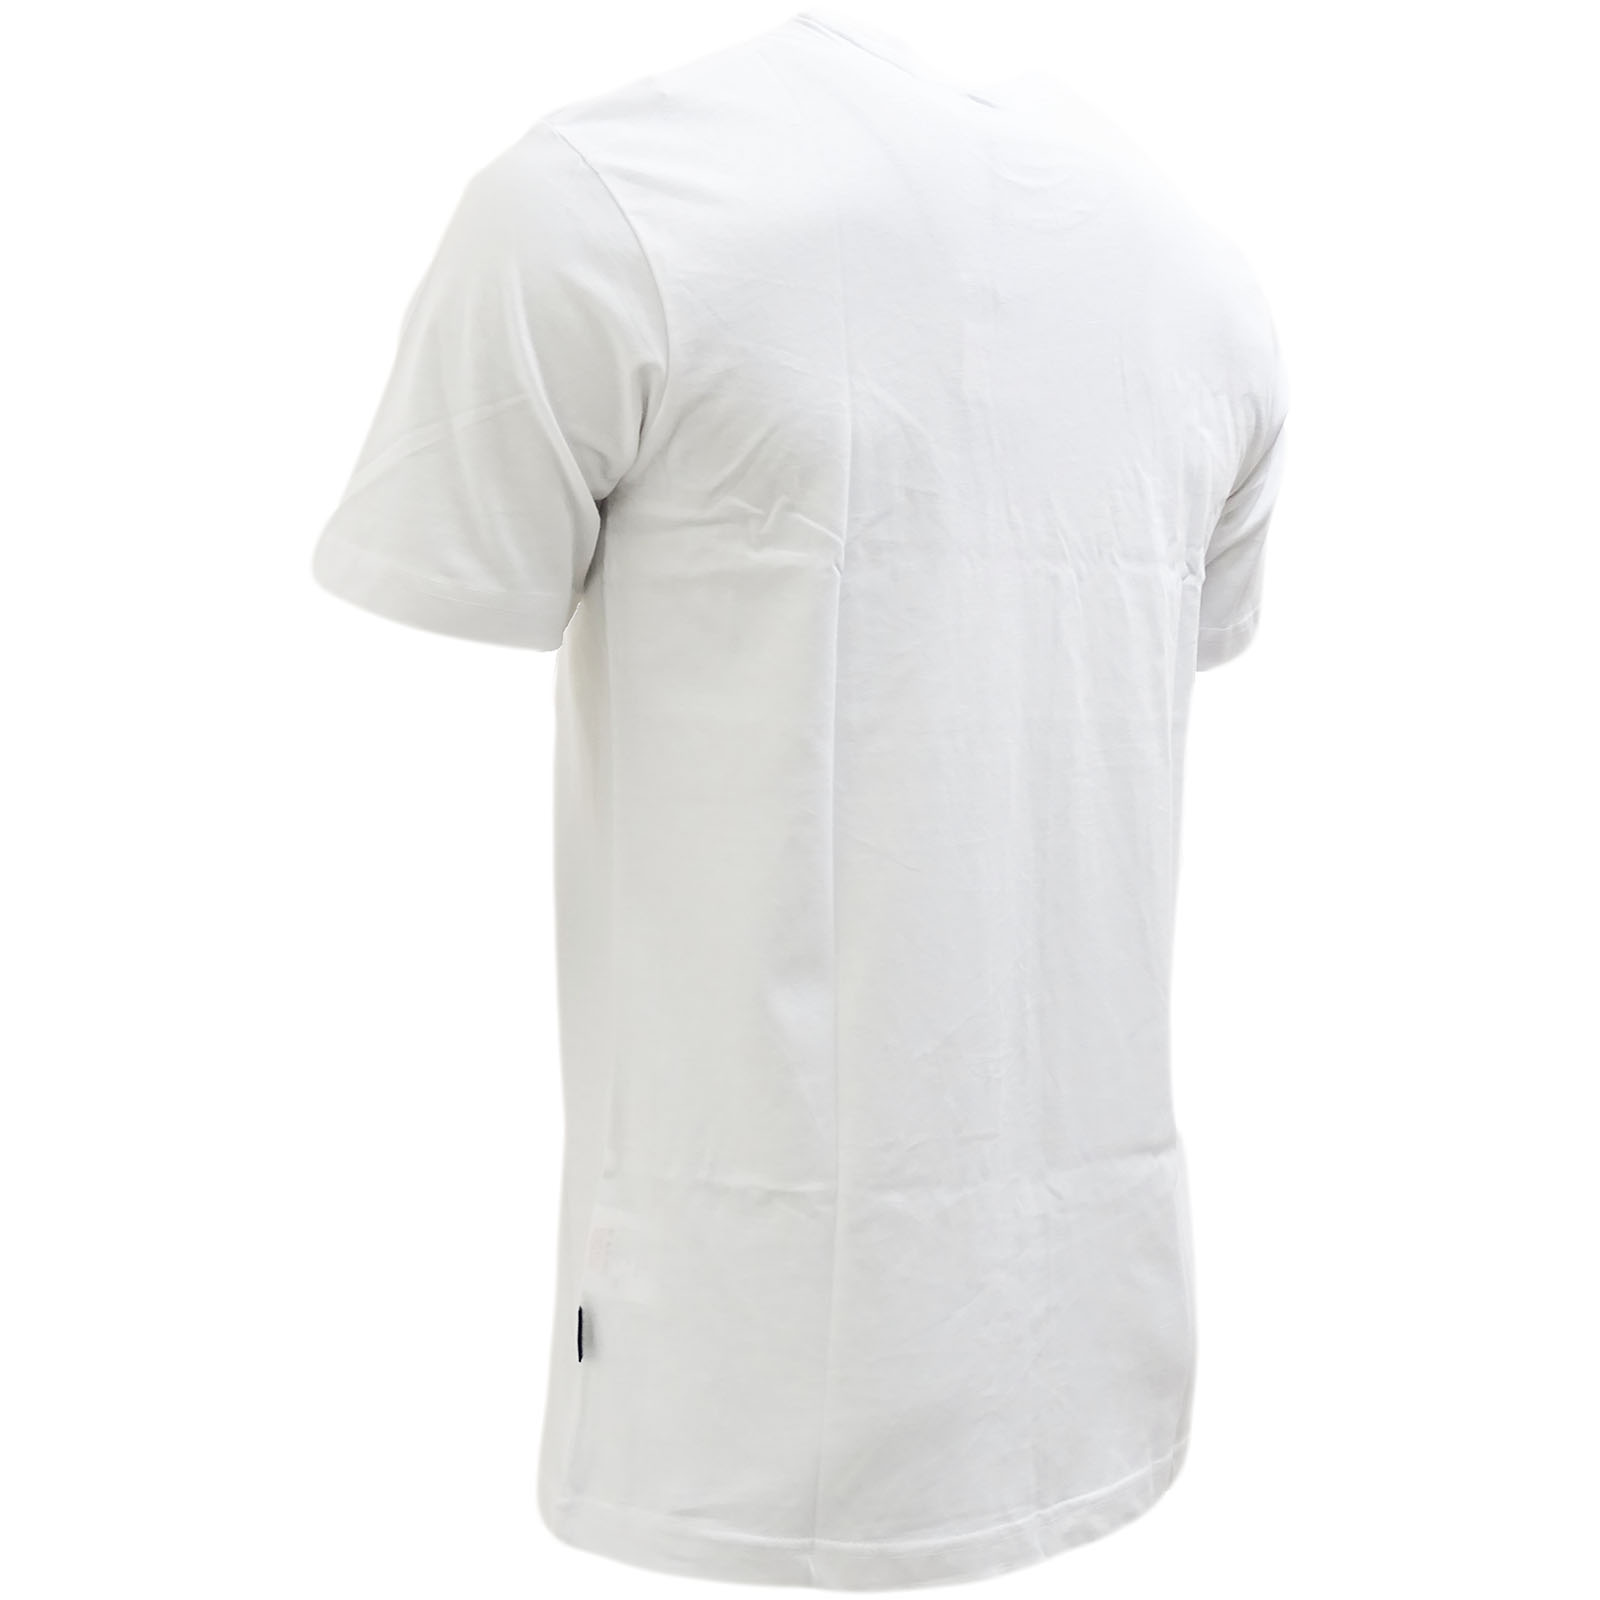 Nicce Chest Logo Logo Logo T-Shirt - Cts03   Förderung    Genial Und Praktisch  2b48fa